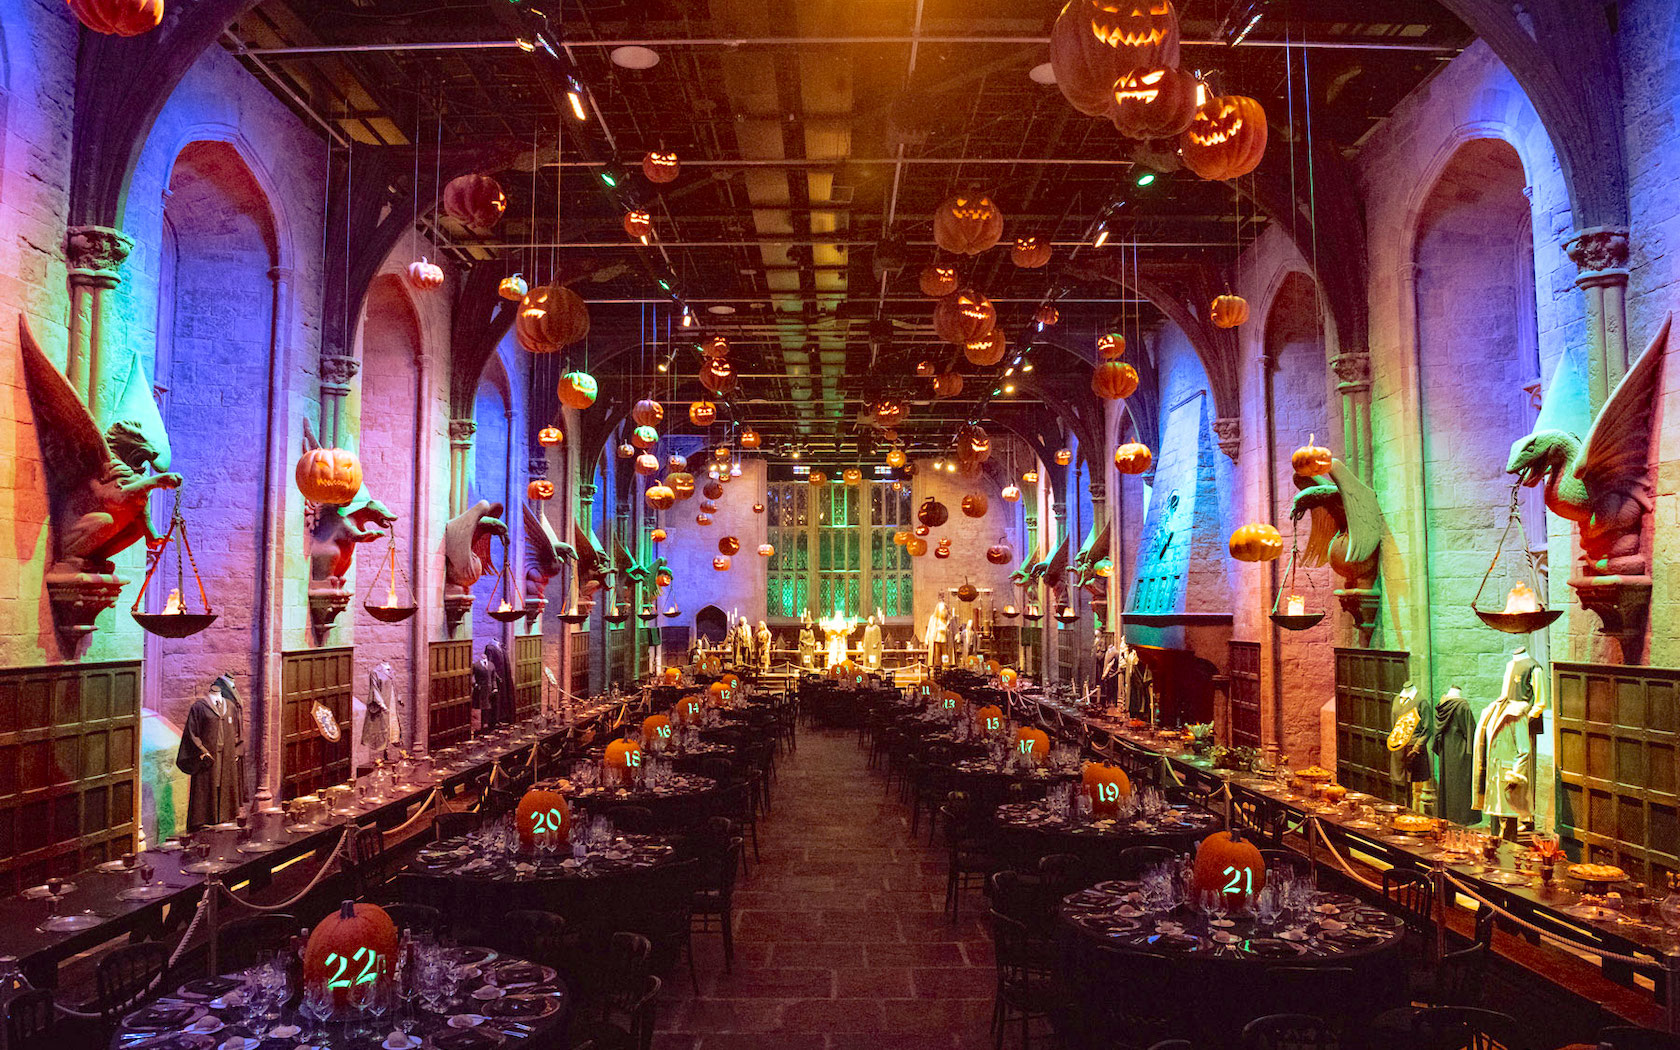 Hogwarts After Dark Tour Returns To London This Halloween